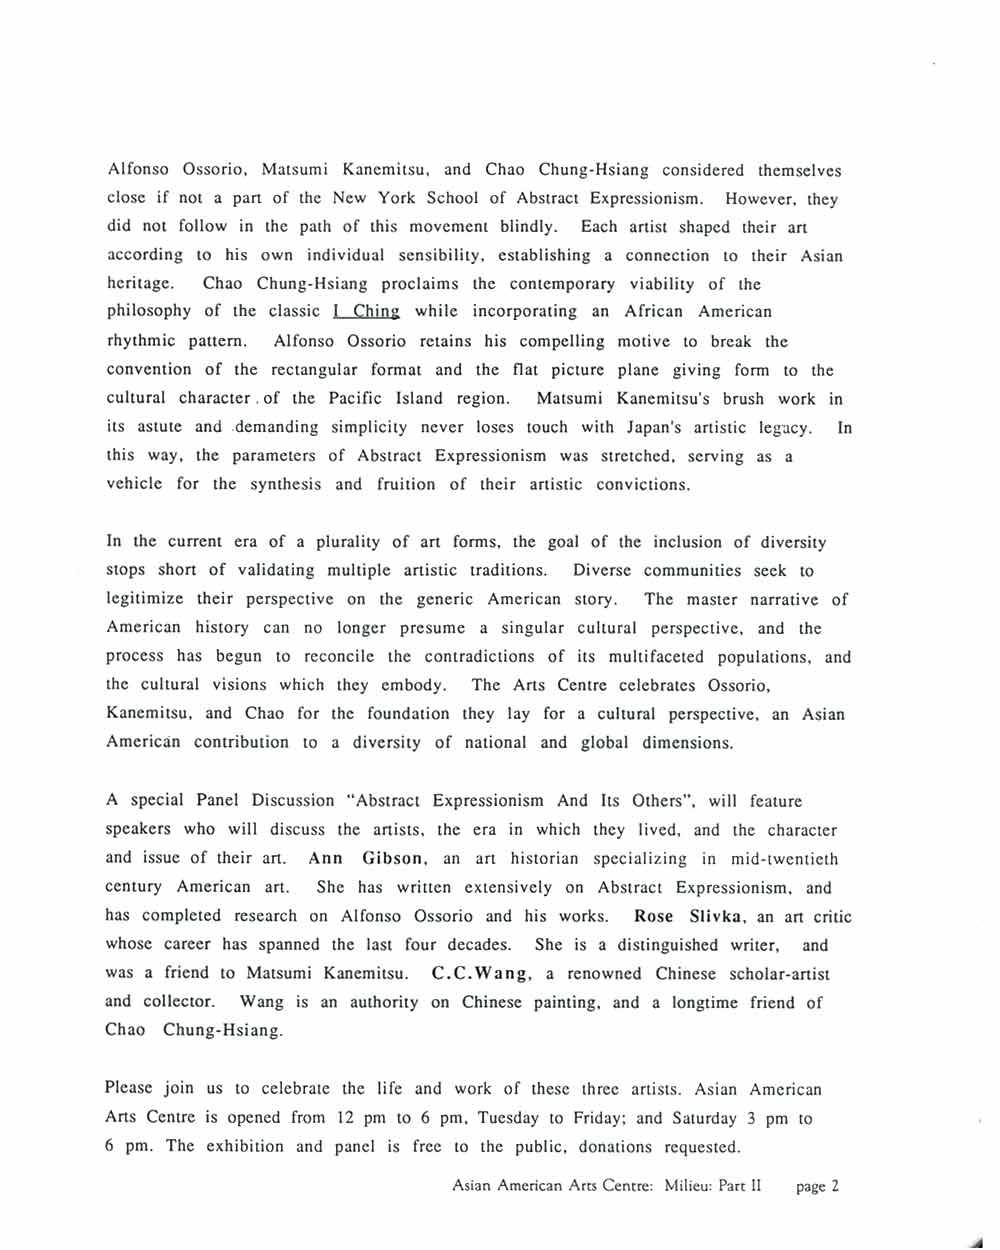 Milieu: Part II 1945-1965, press release, pg 2